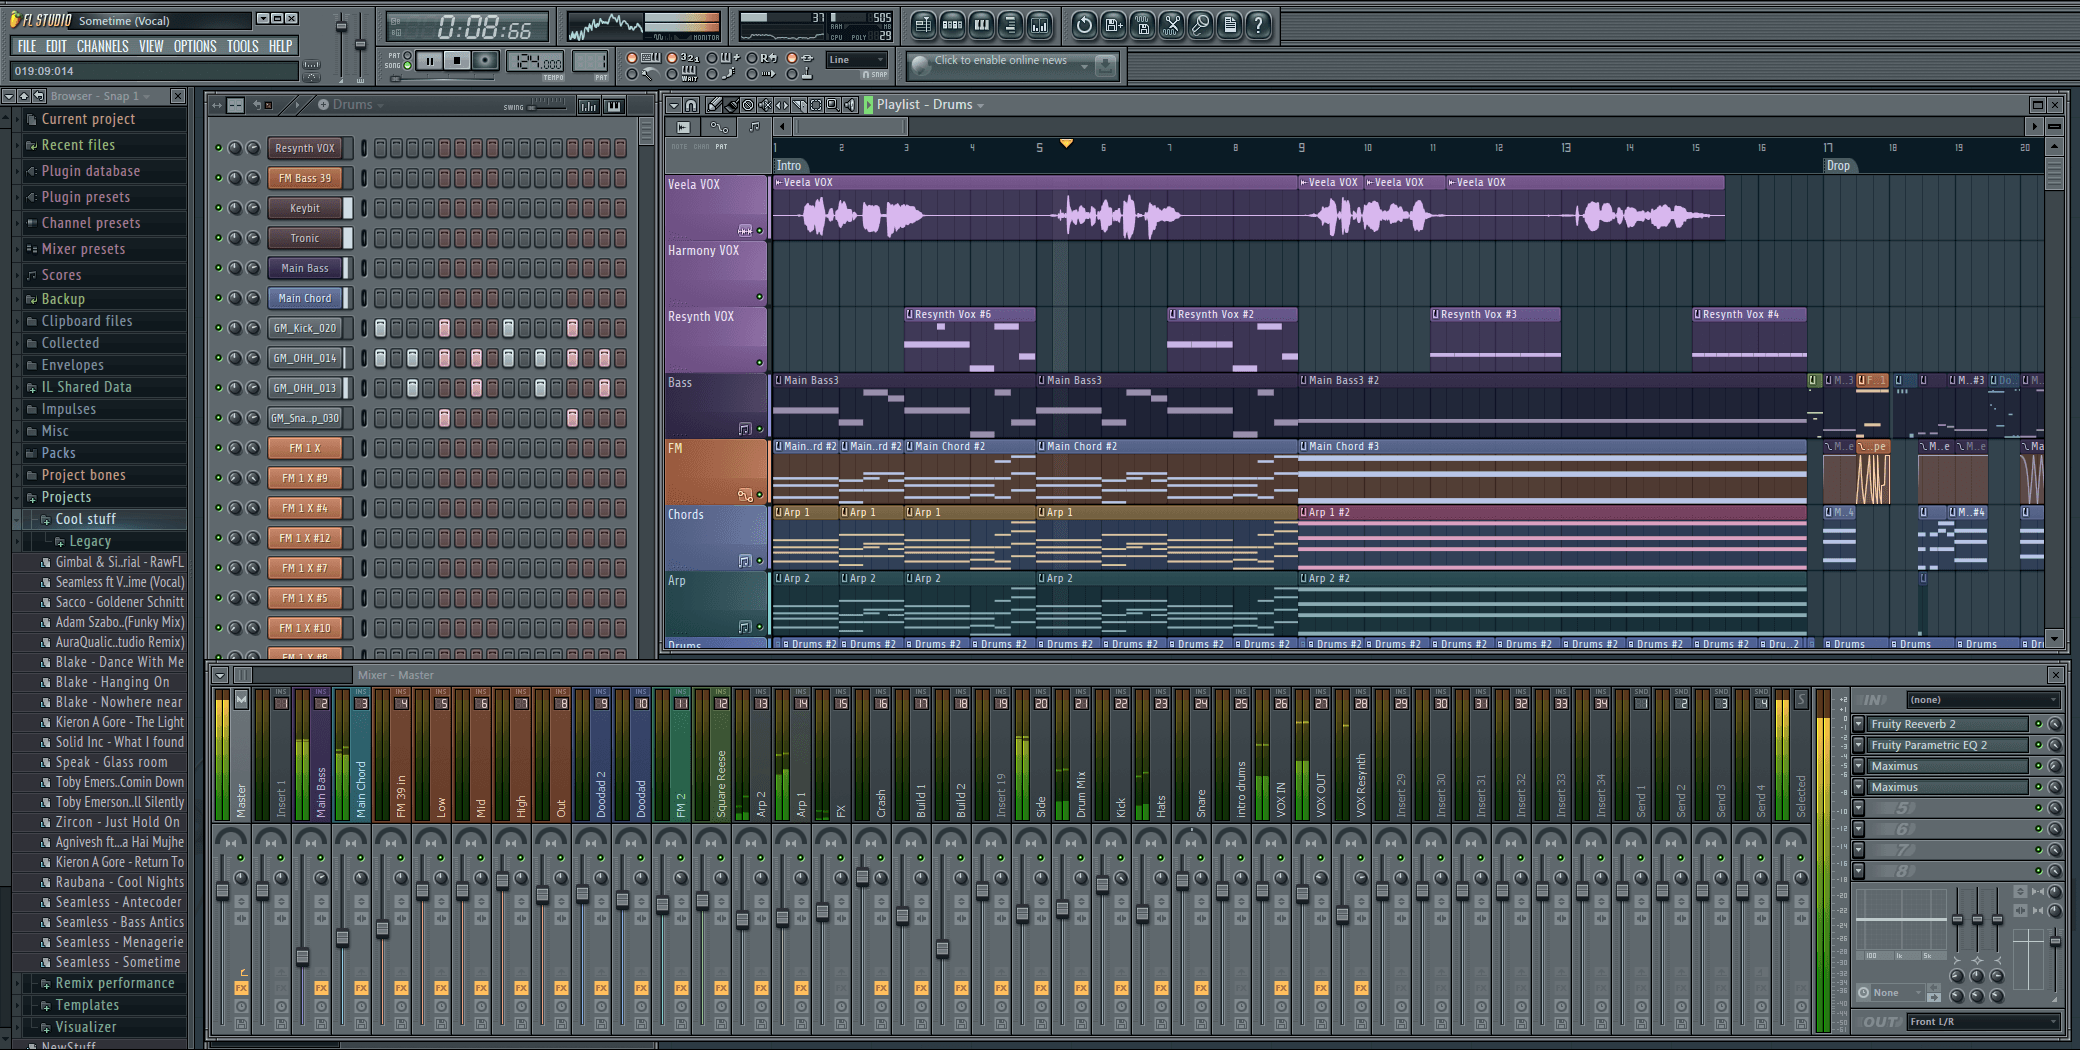 FL Studio 20.5.1.1193